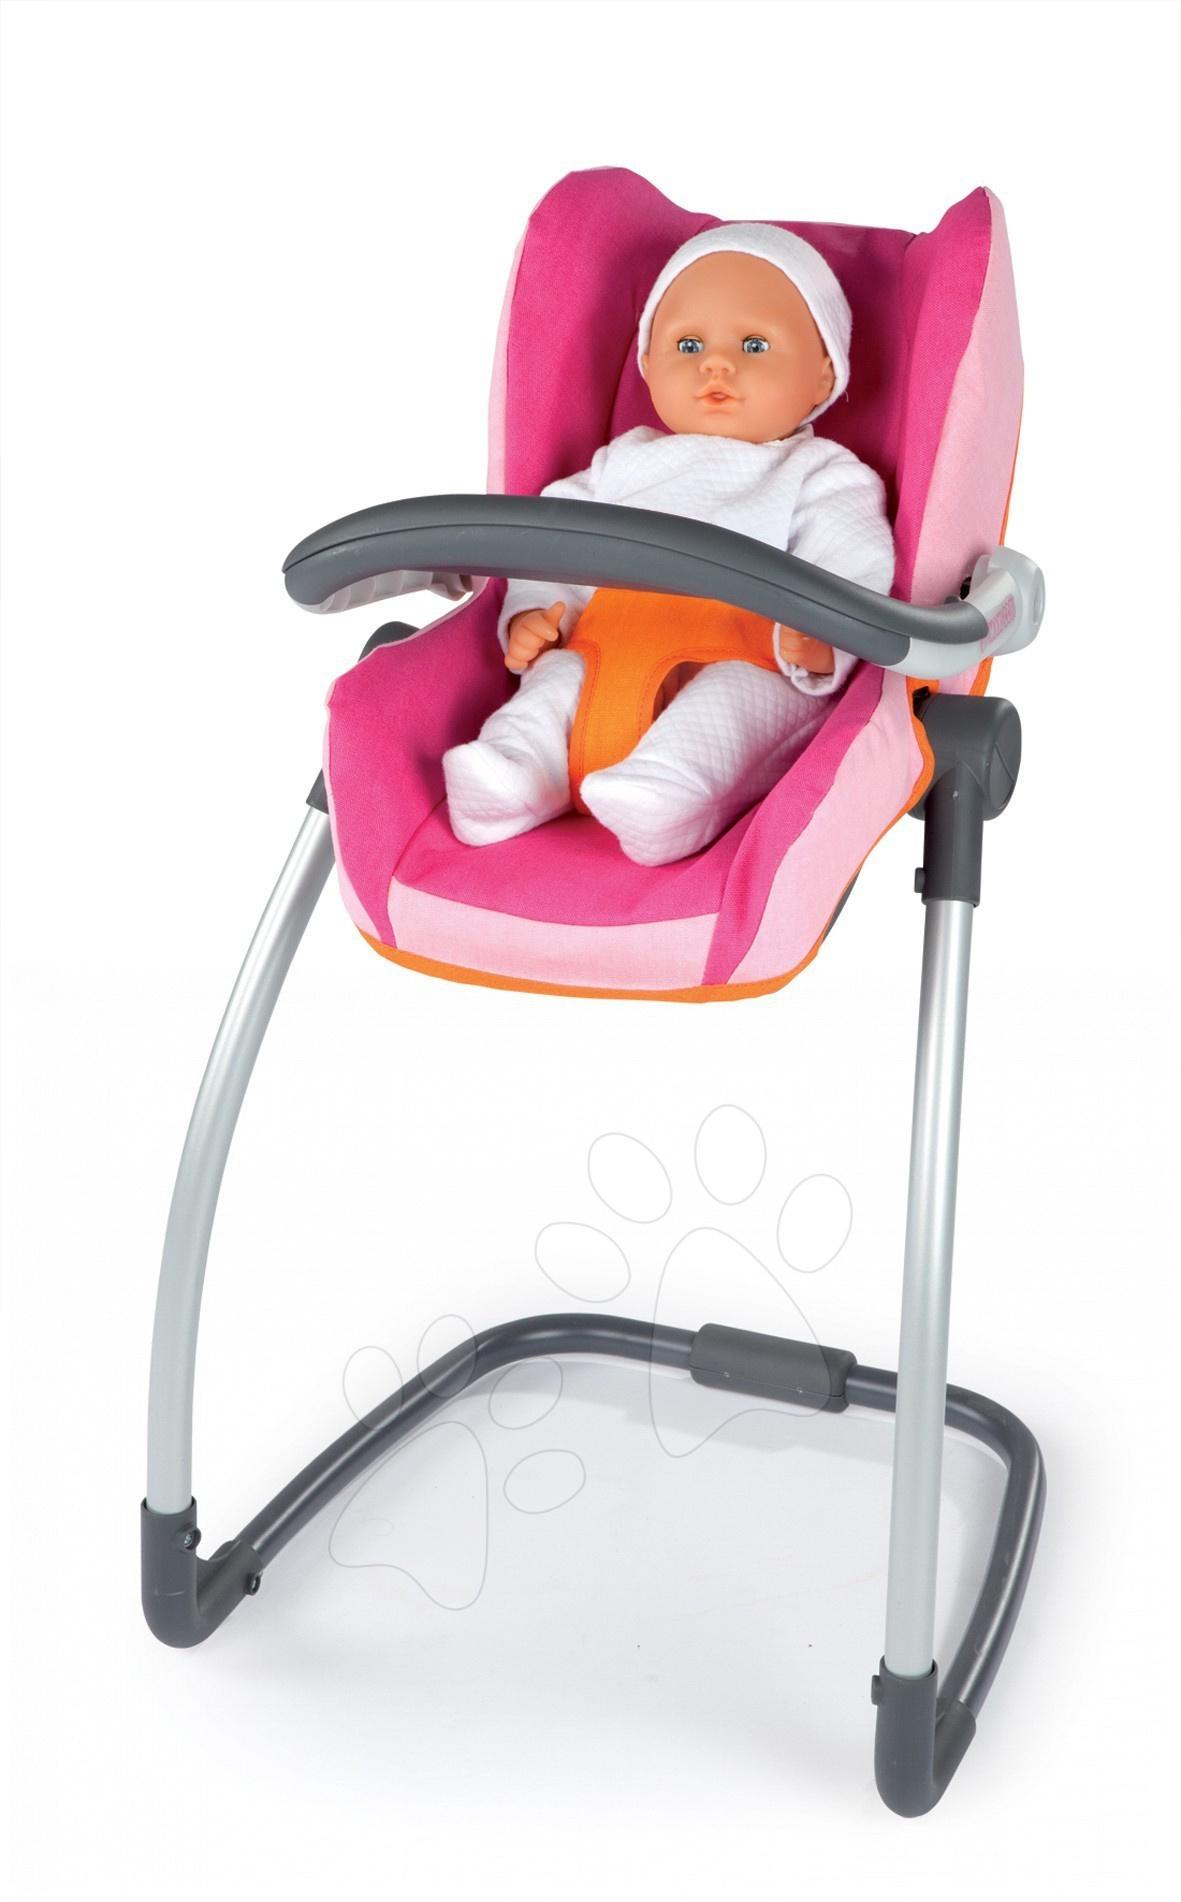 Staré položky - Set Maxi Cosi židle Smoby autosedačka a houpačka pro panenku